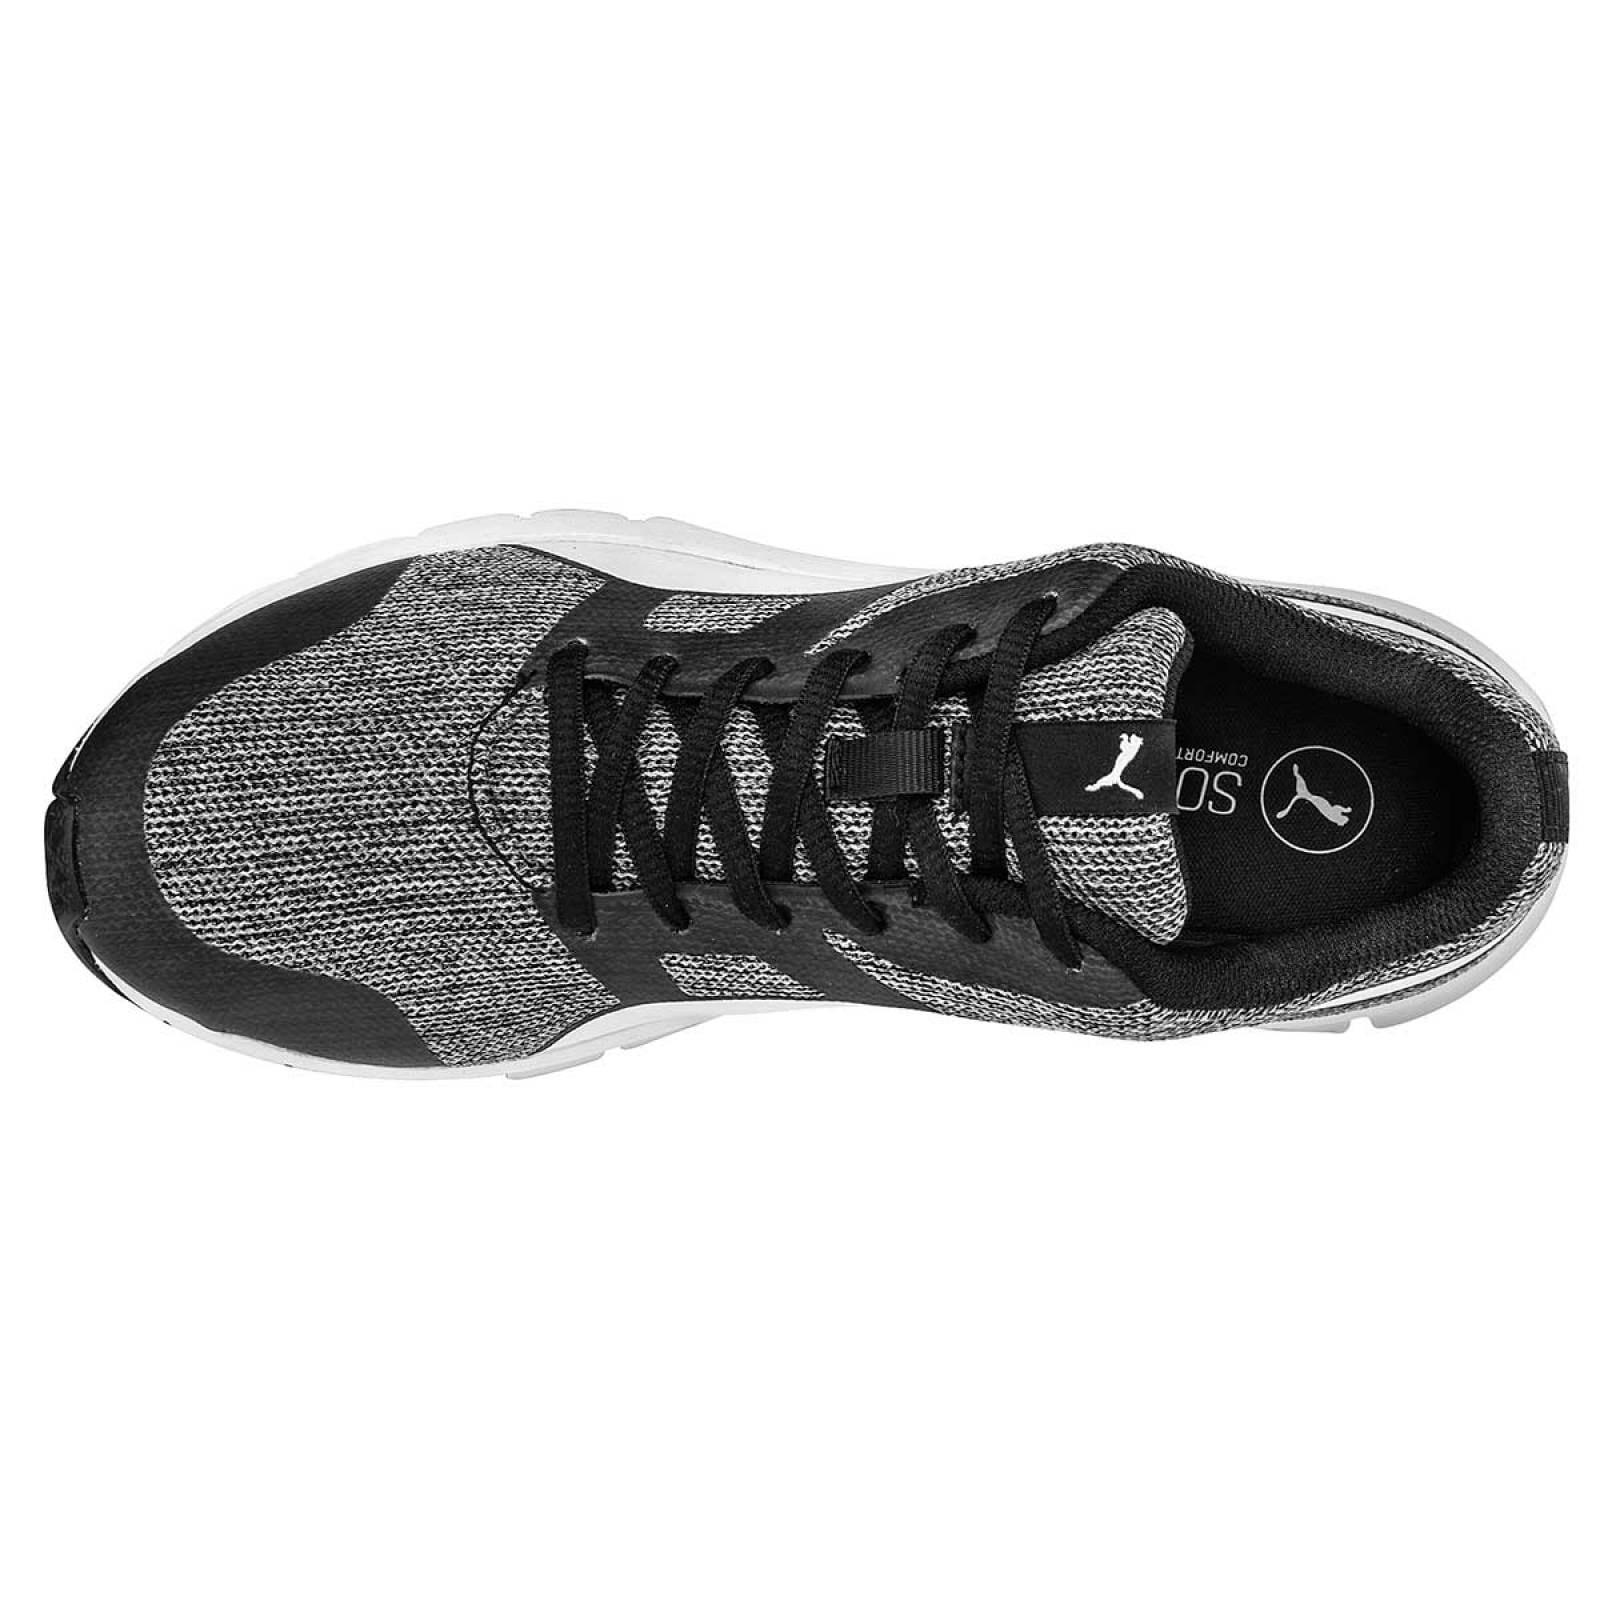 Puma Tenis Joven Negro gris flexracer multiknit jr